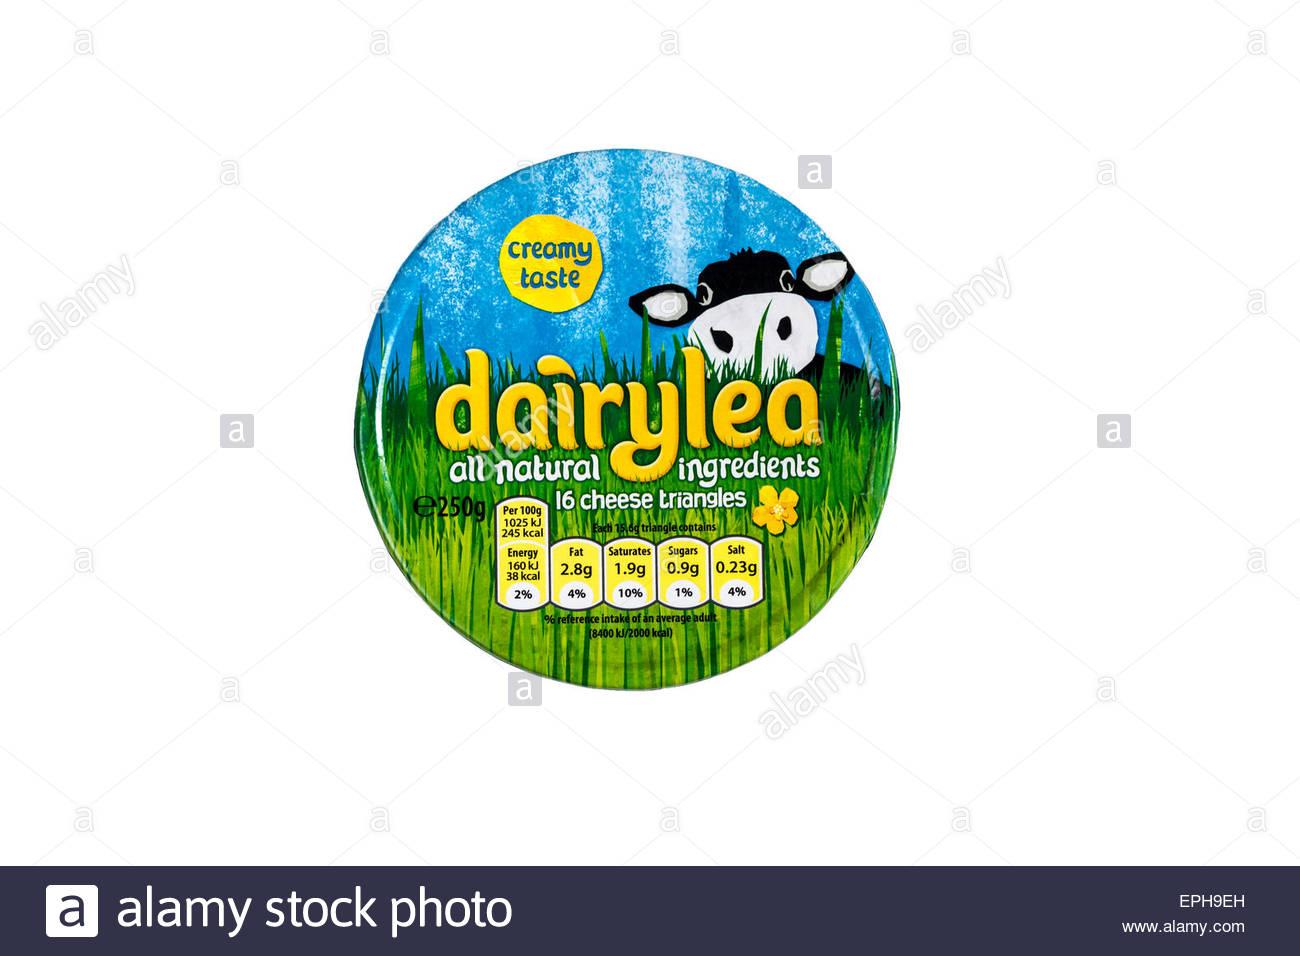 Dairylea Triangles Box - Stock Image